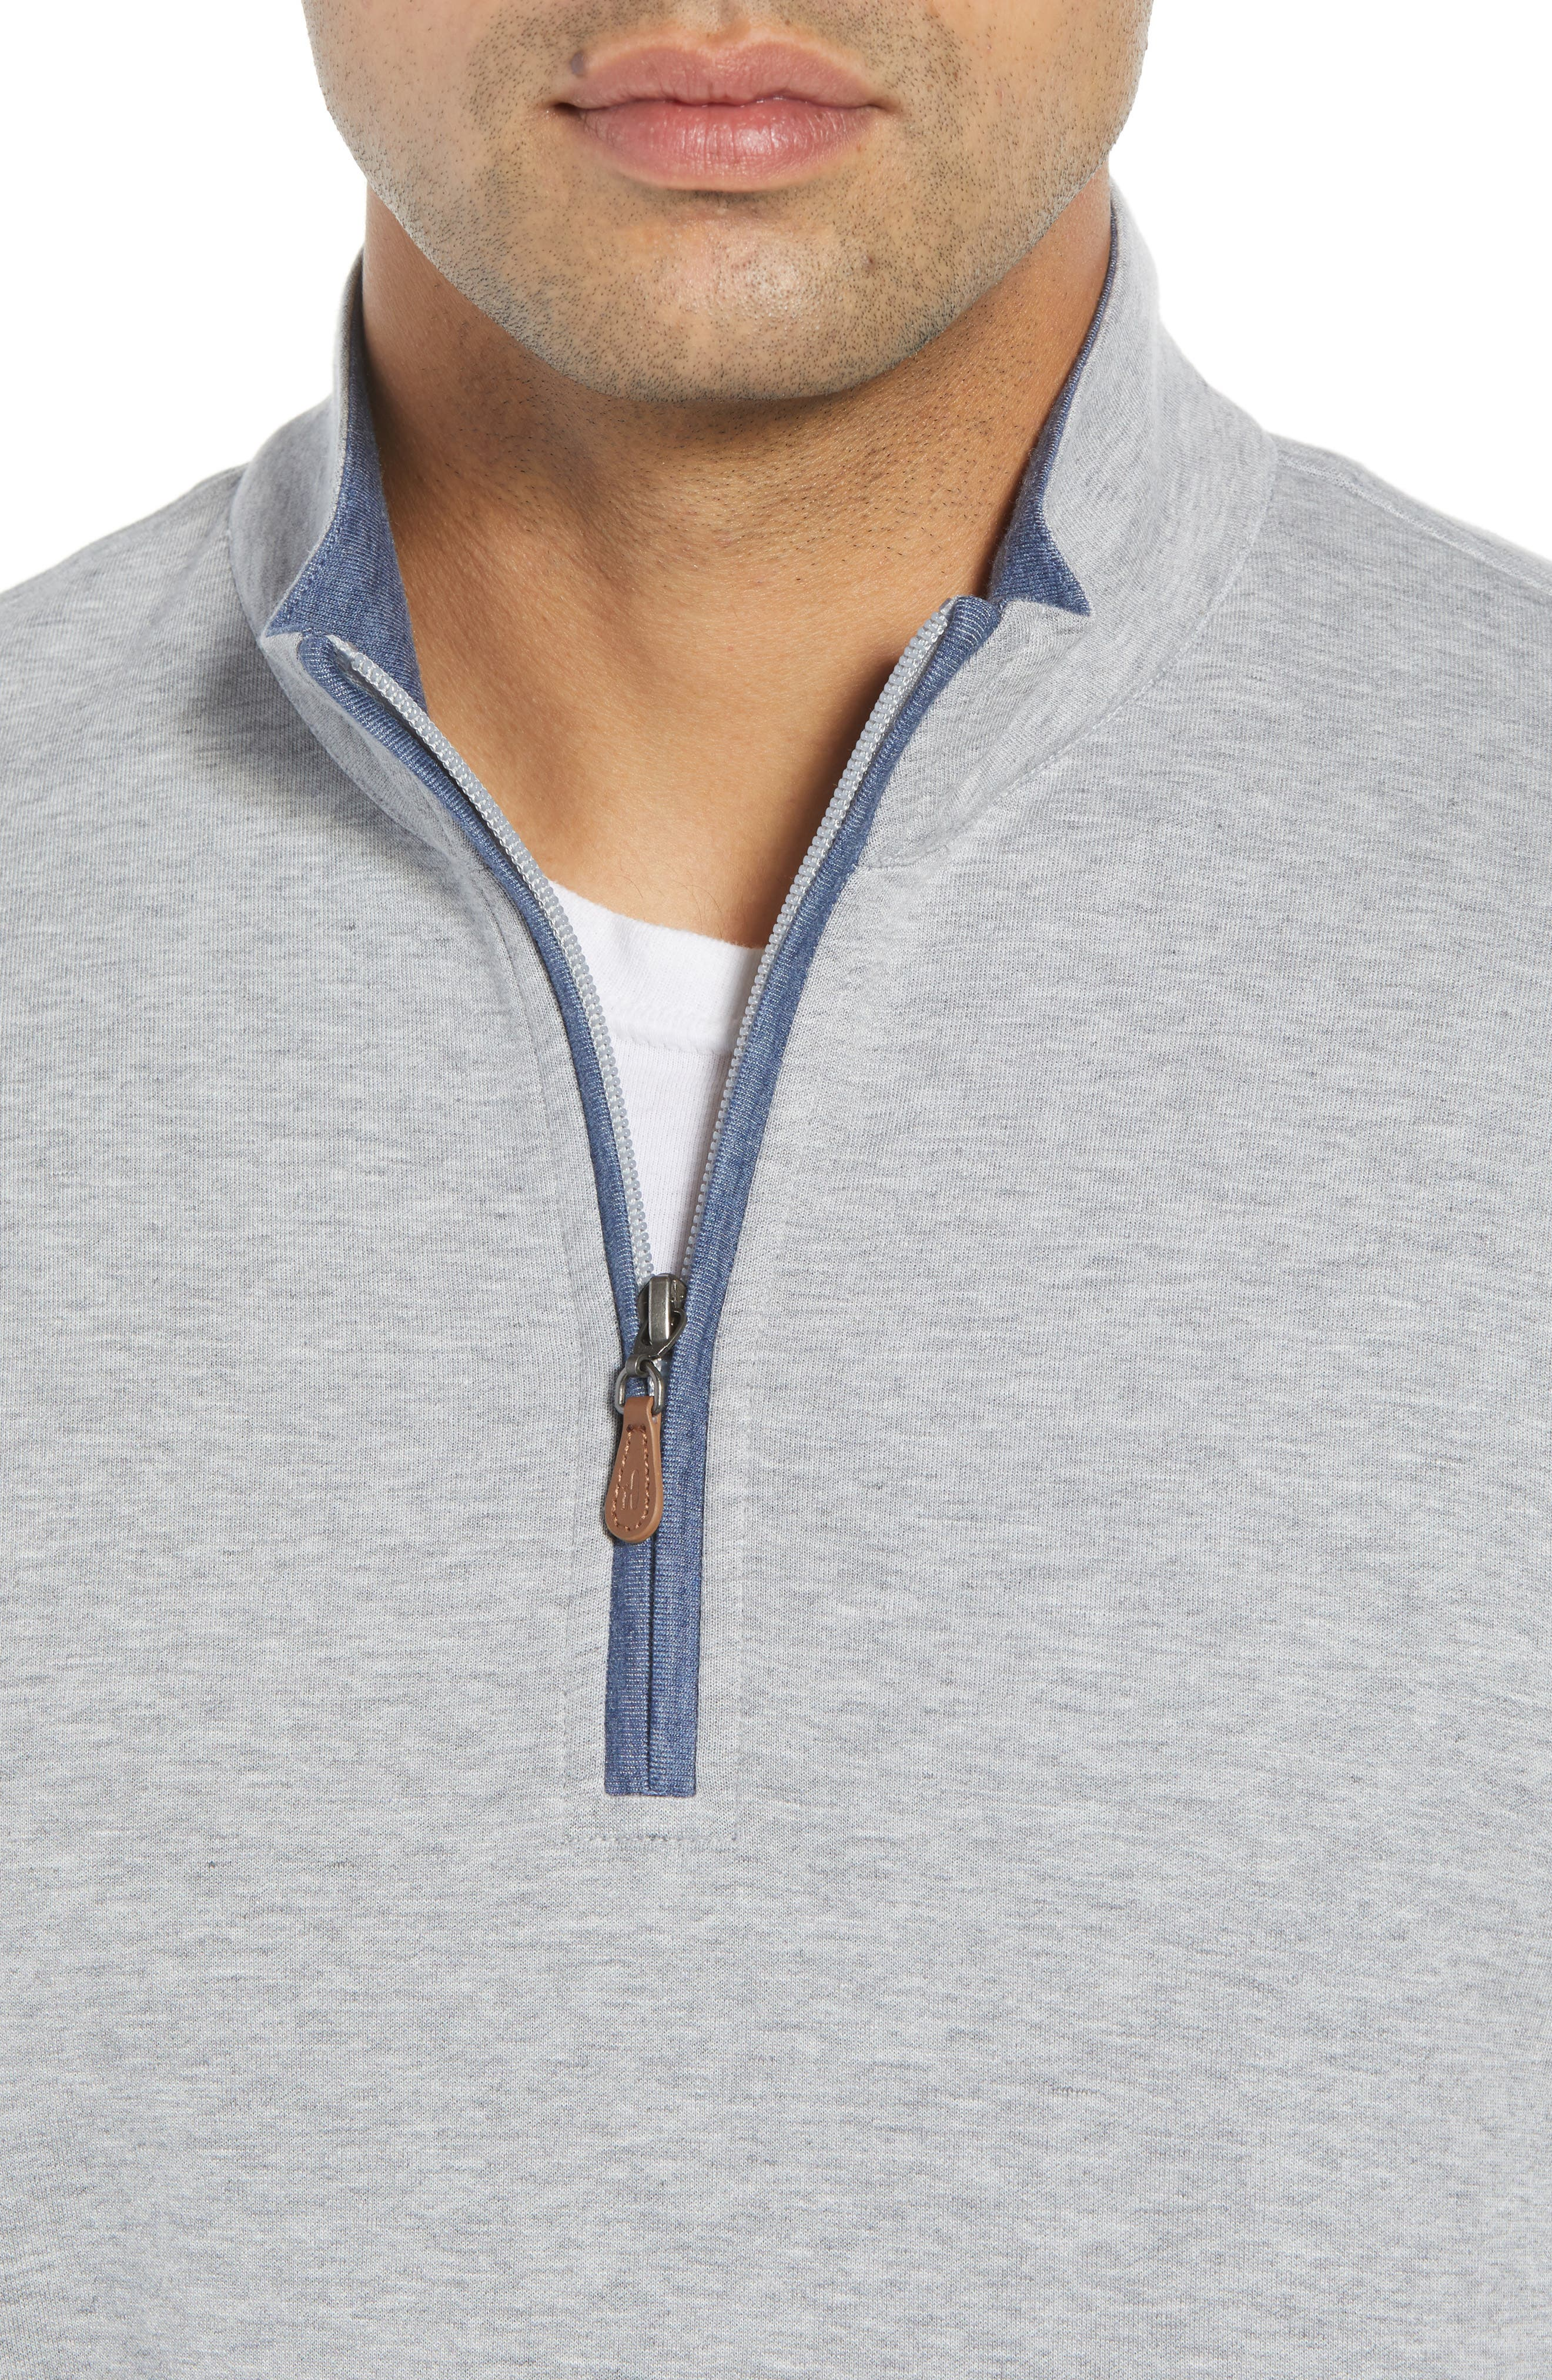 Sully Quarter Zip Pullover,                             Alternate thumbnail 4, color,                             LIGHT GREY